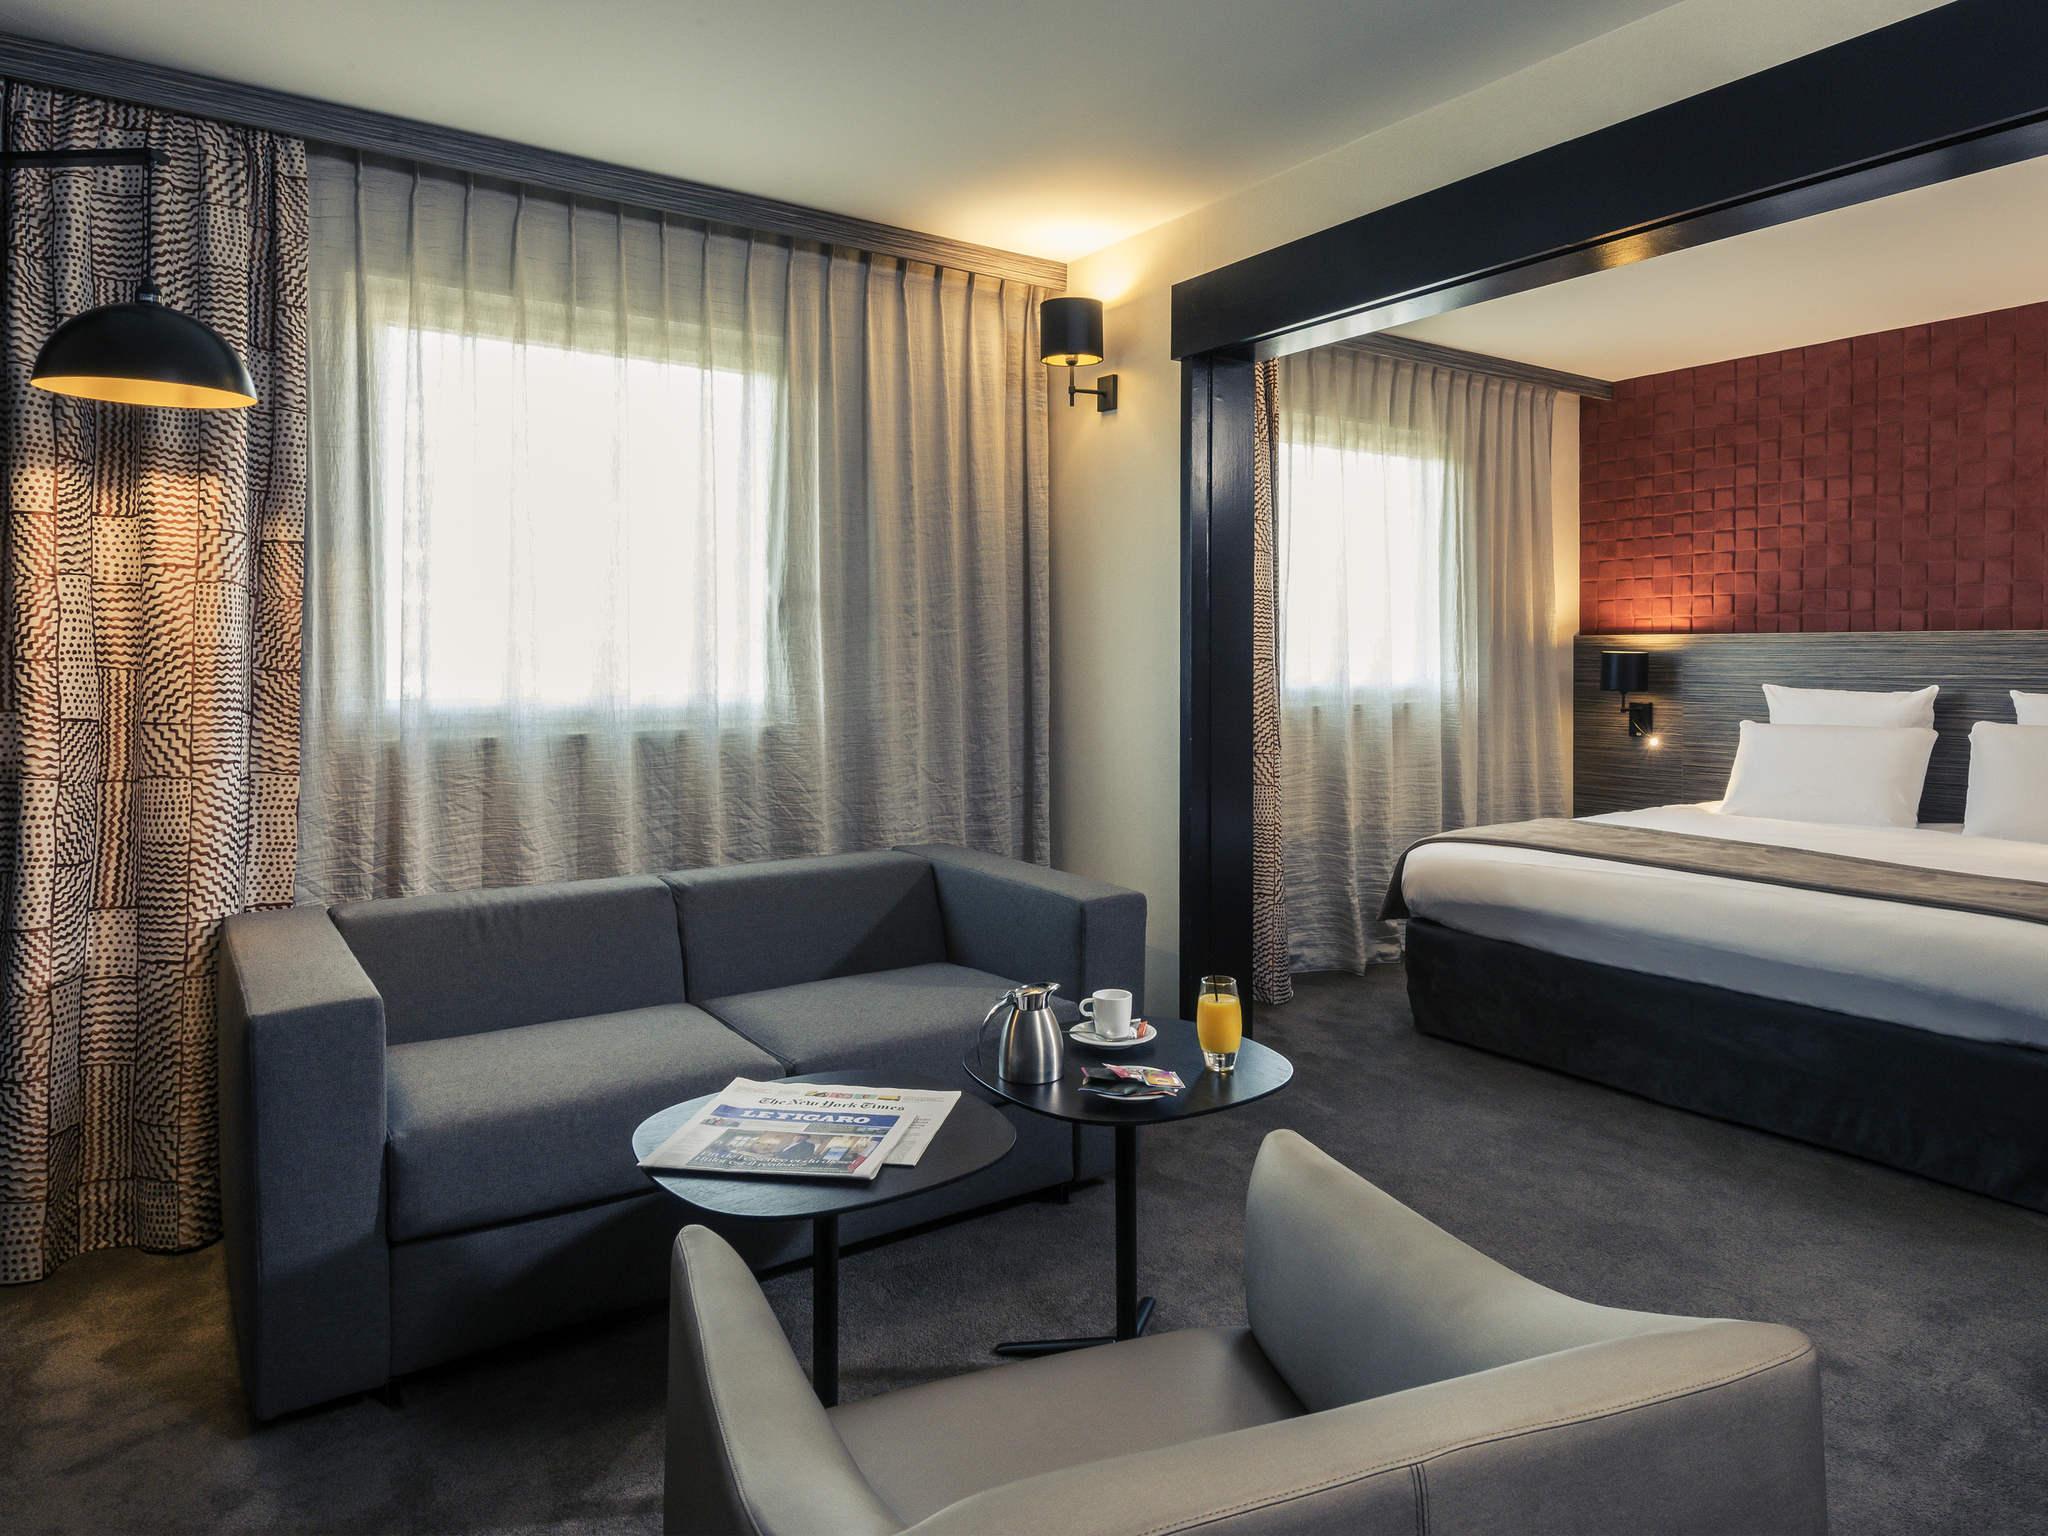 Hotel Paris Porte Pantin